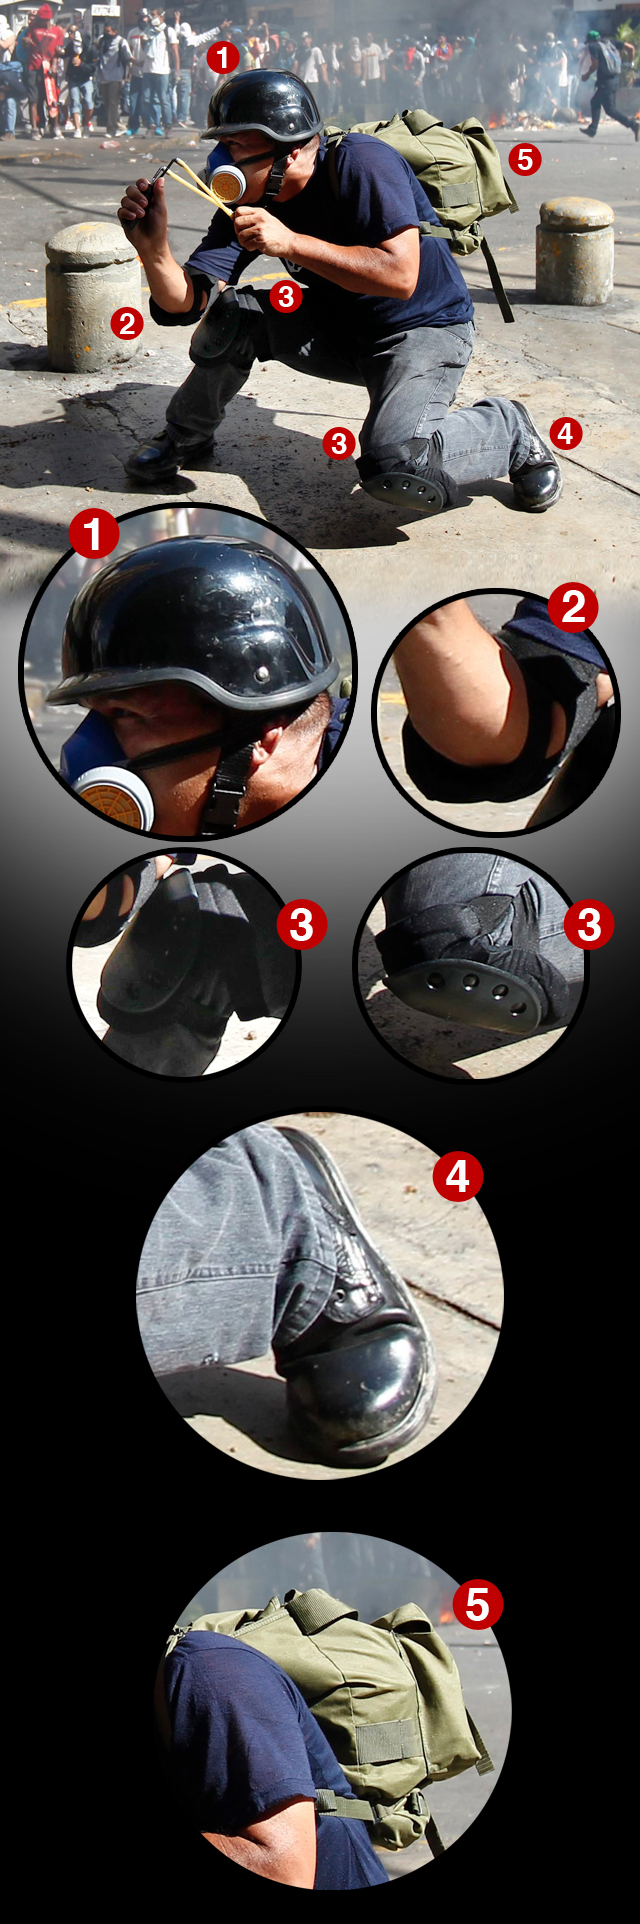 Venezuela: ¿Estudiante o policía infiltrado?